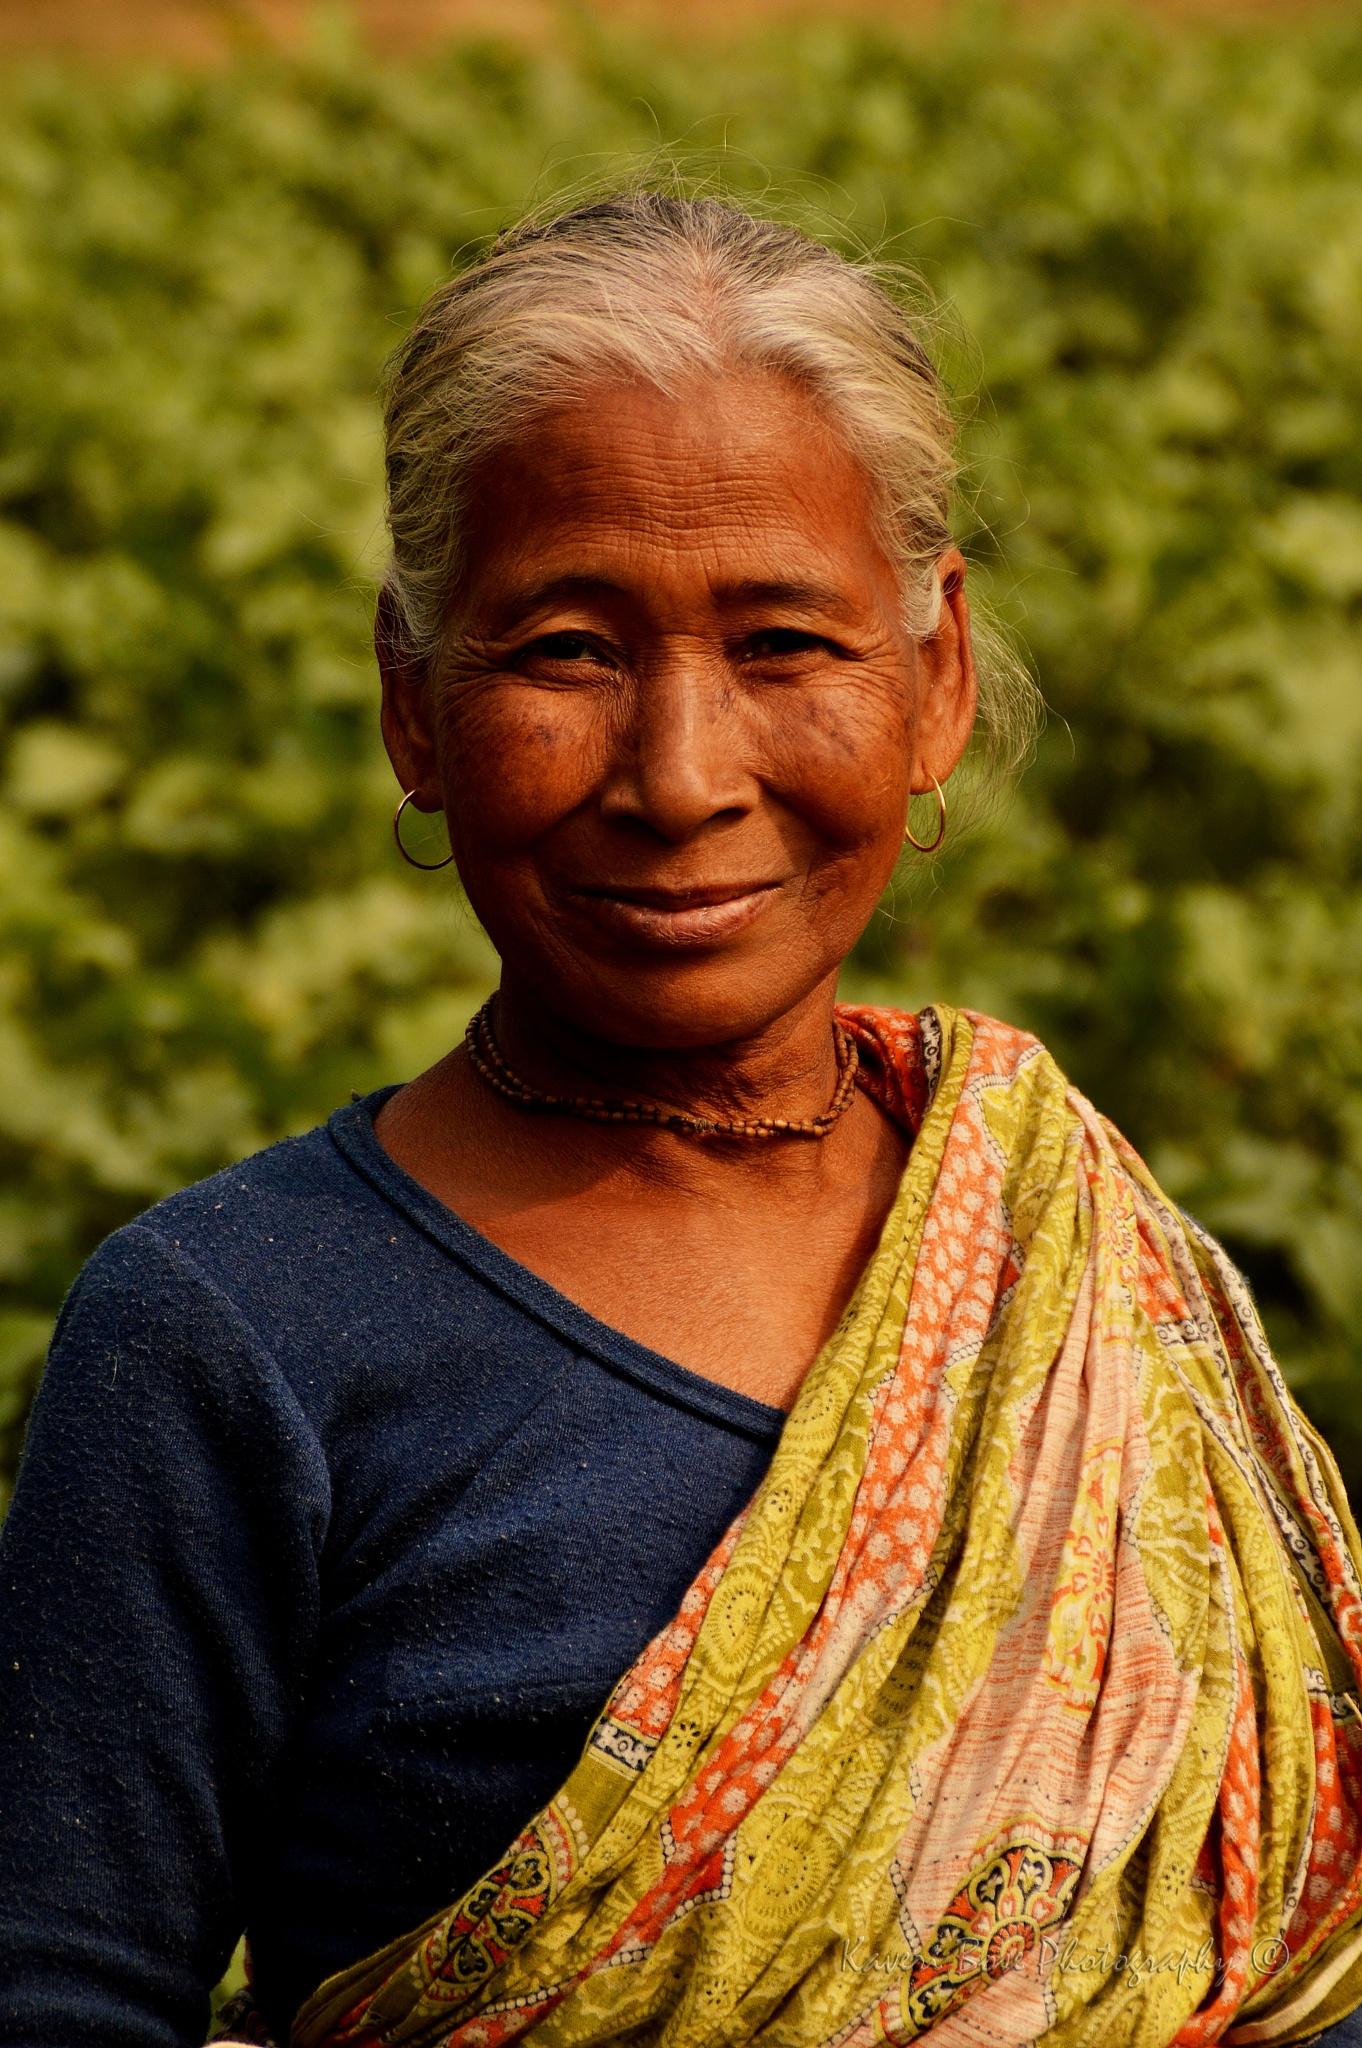 Portrait of an Old village farmer by Kaveri Bose